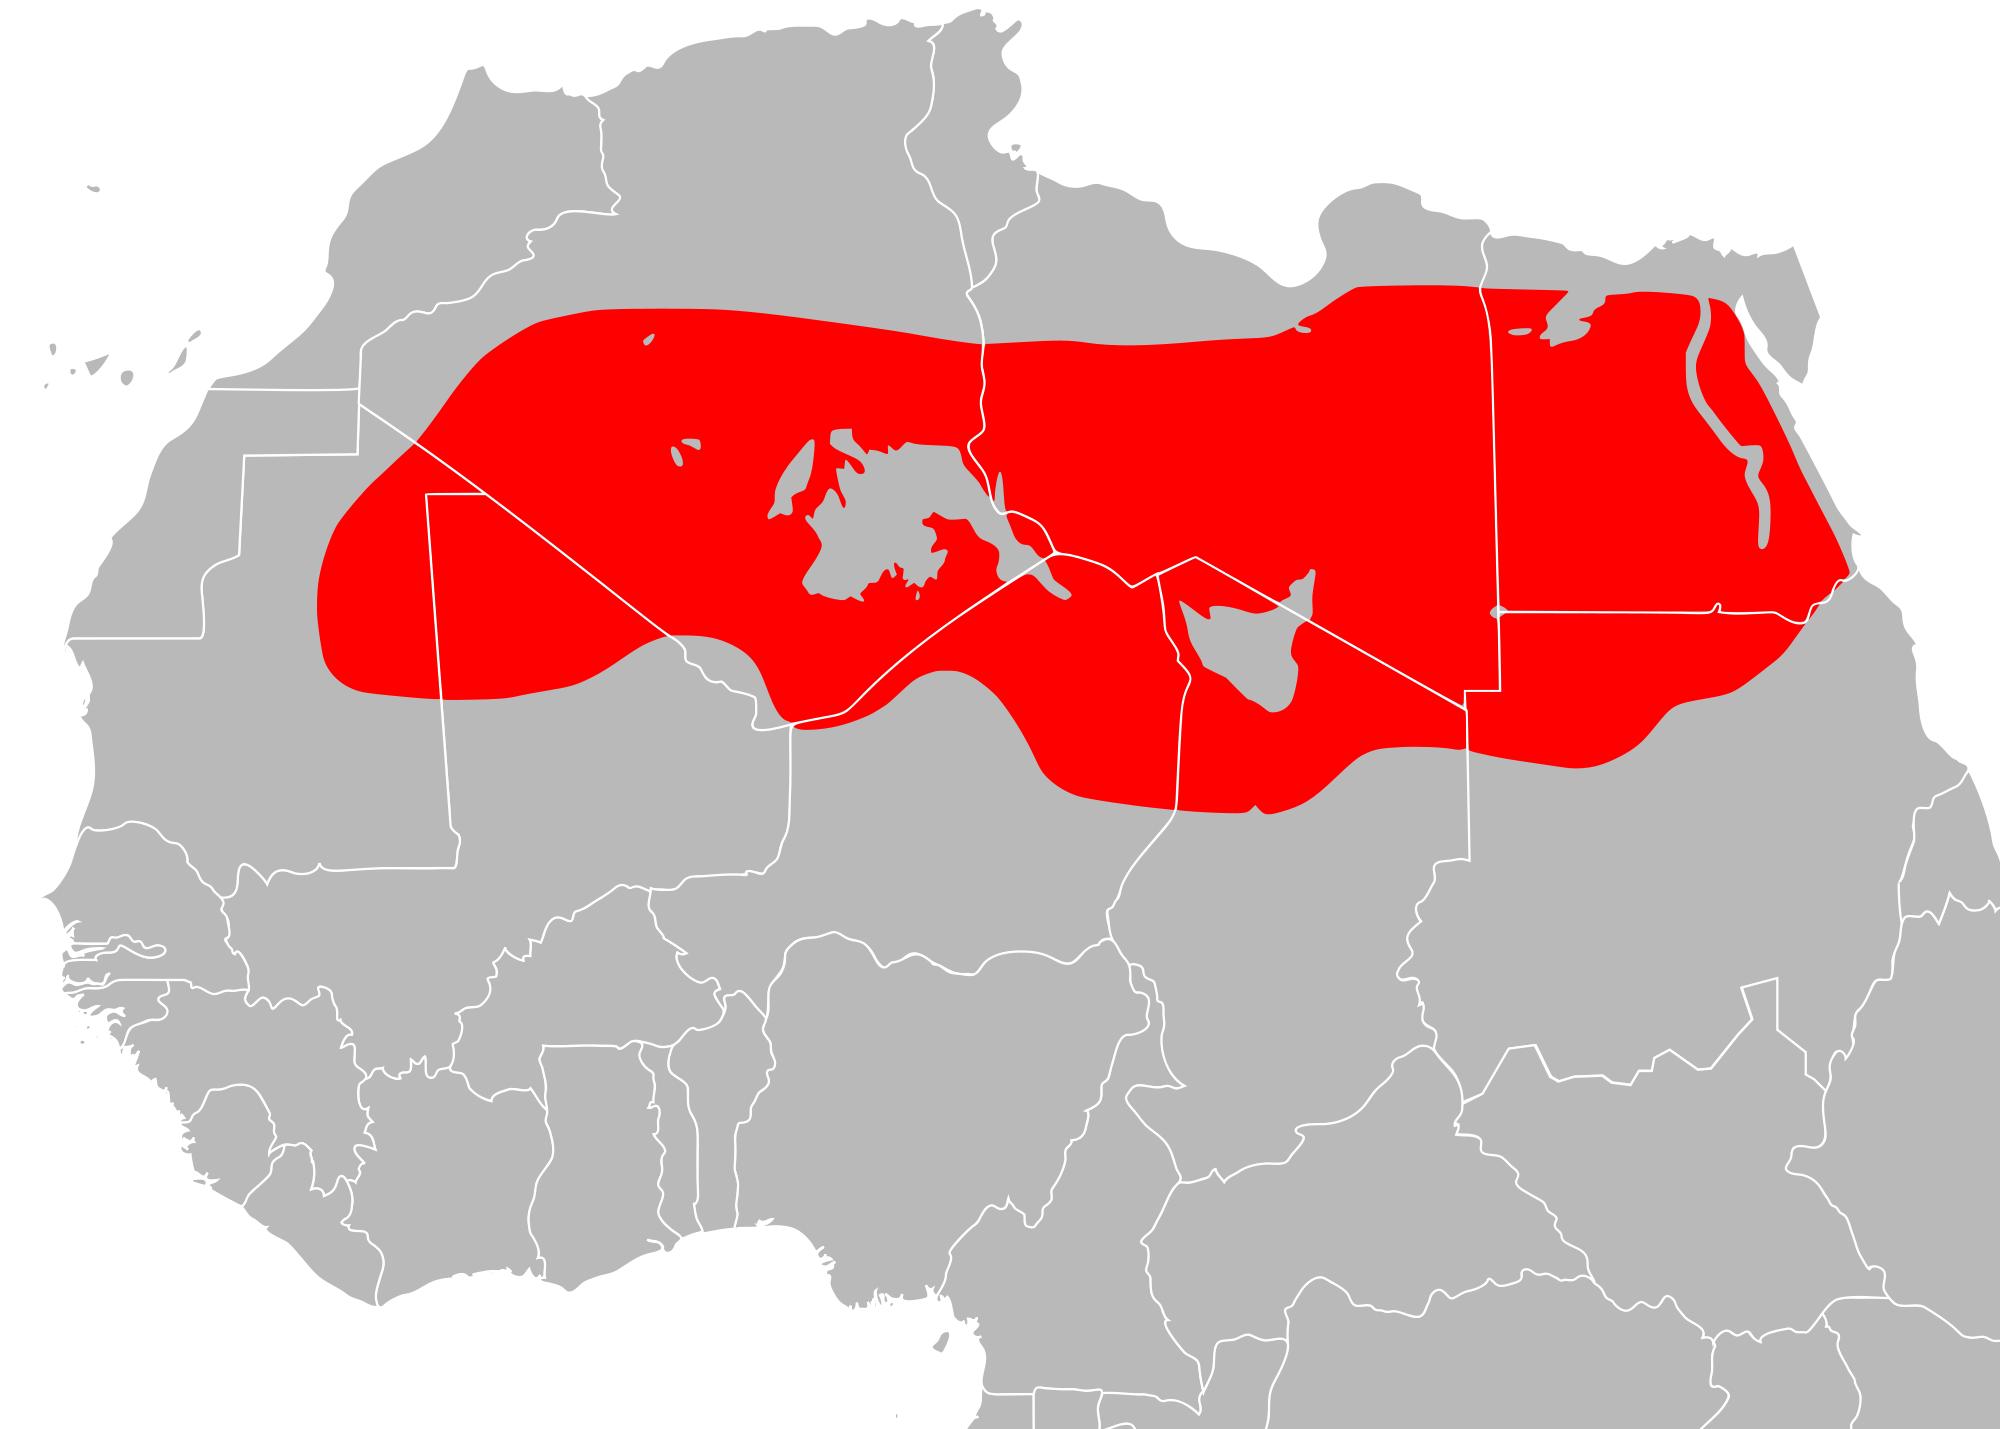 File:PA1327 map.png - Wikimedia Commons